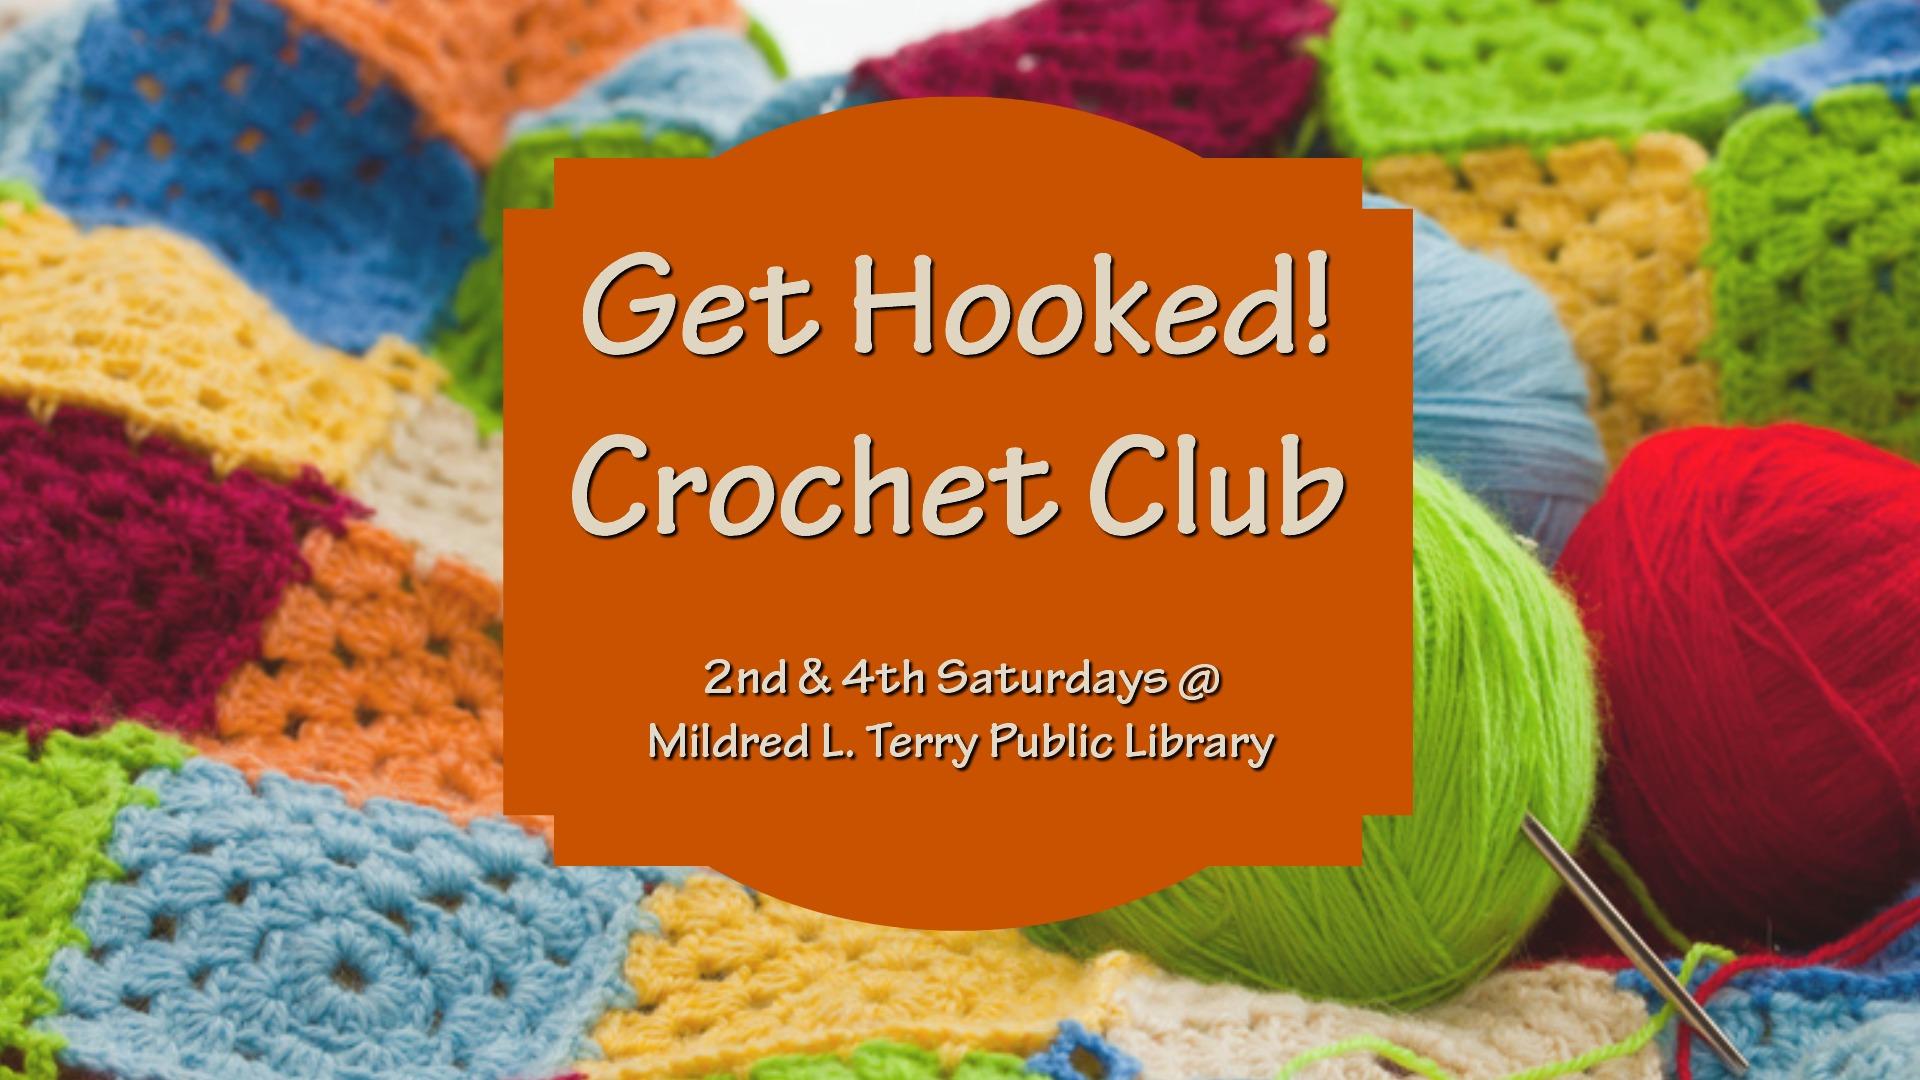 Get Hooked: Crochet Club